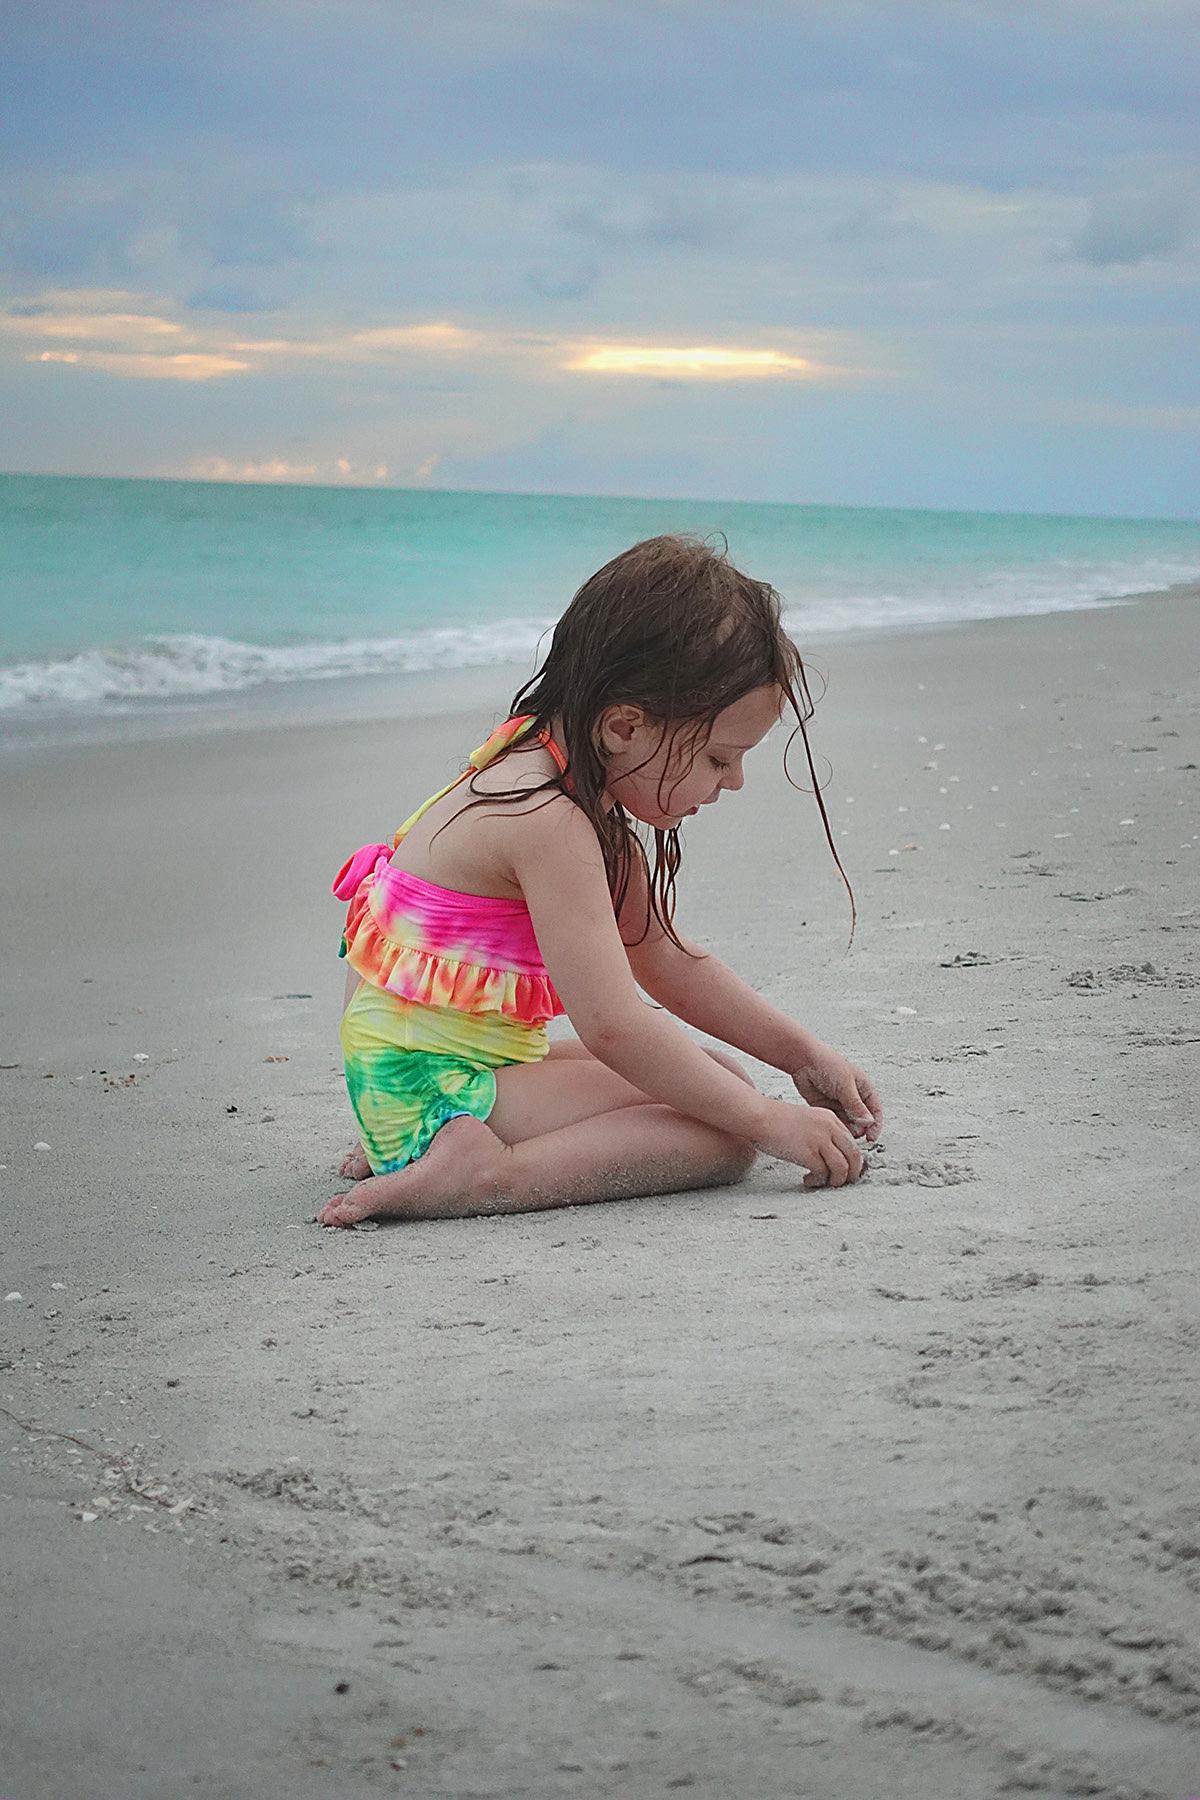 waterside inn on the beach sanibel island florida